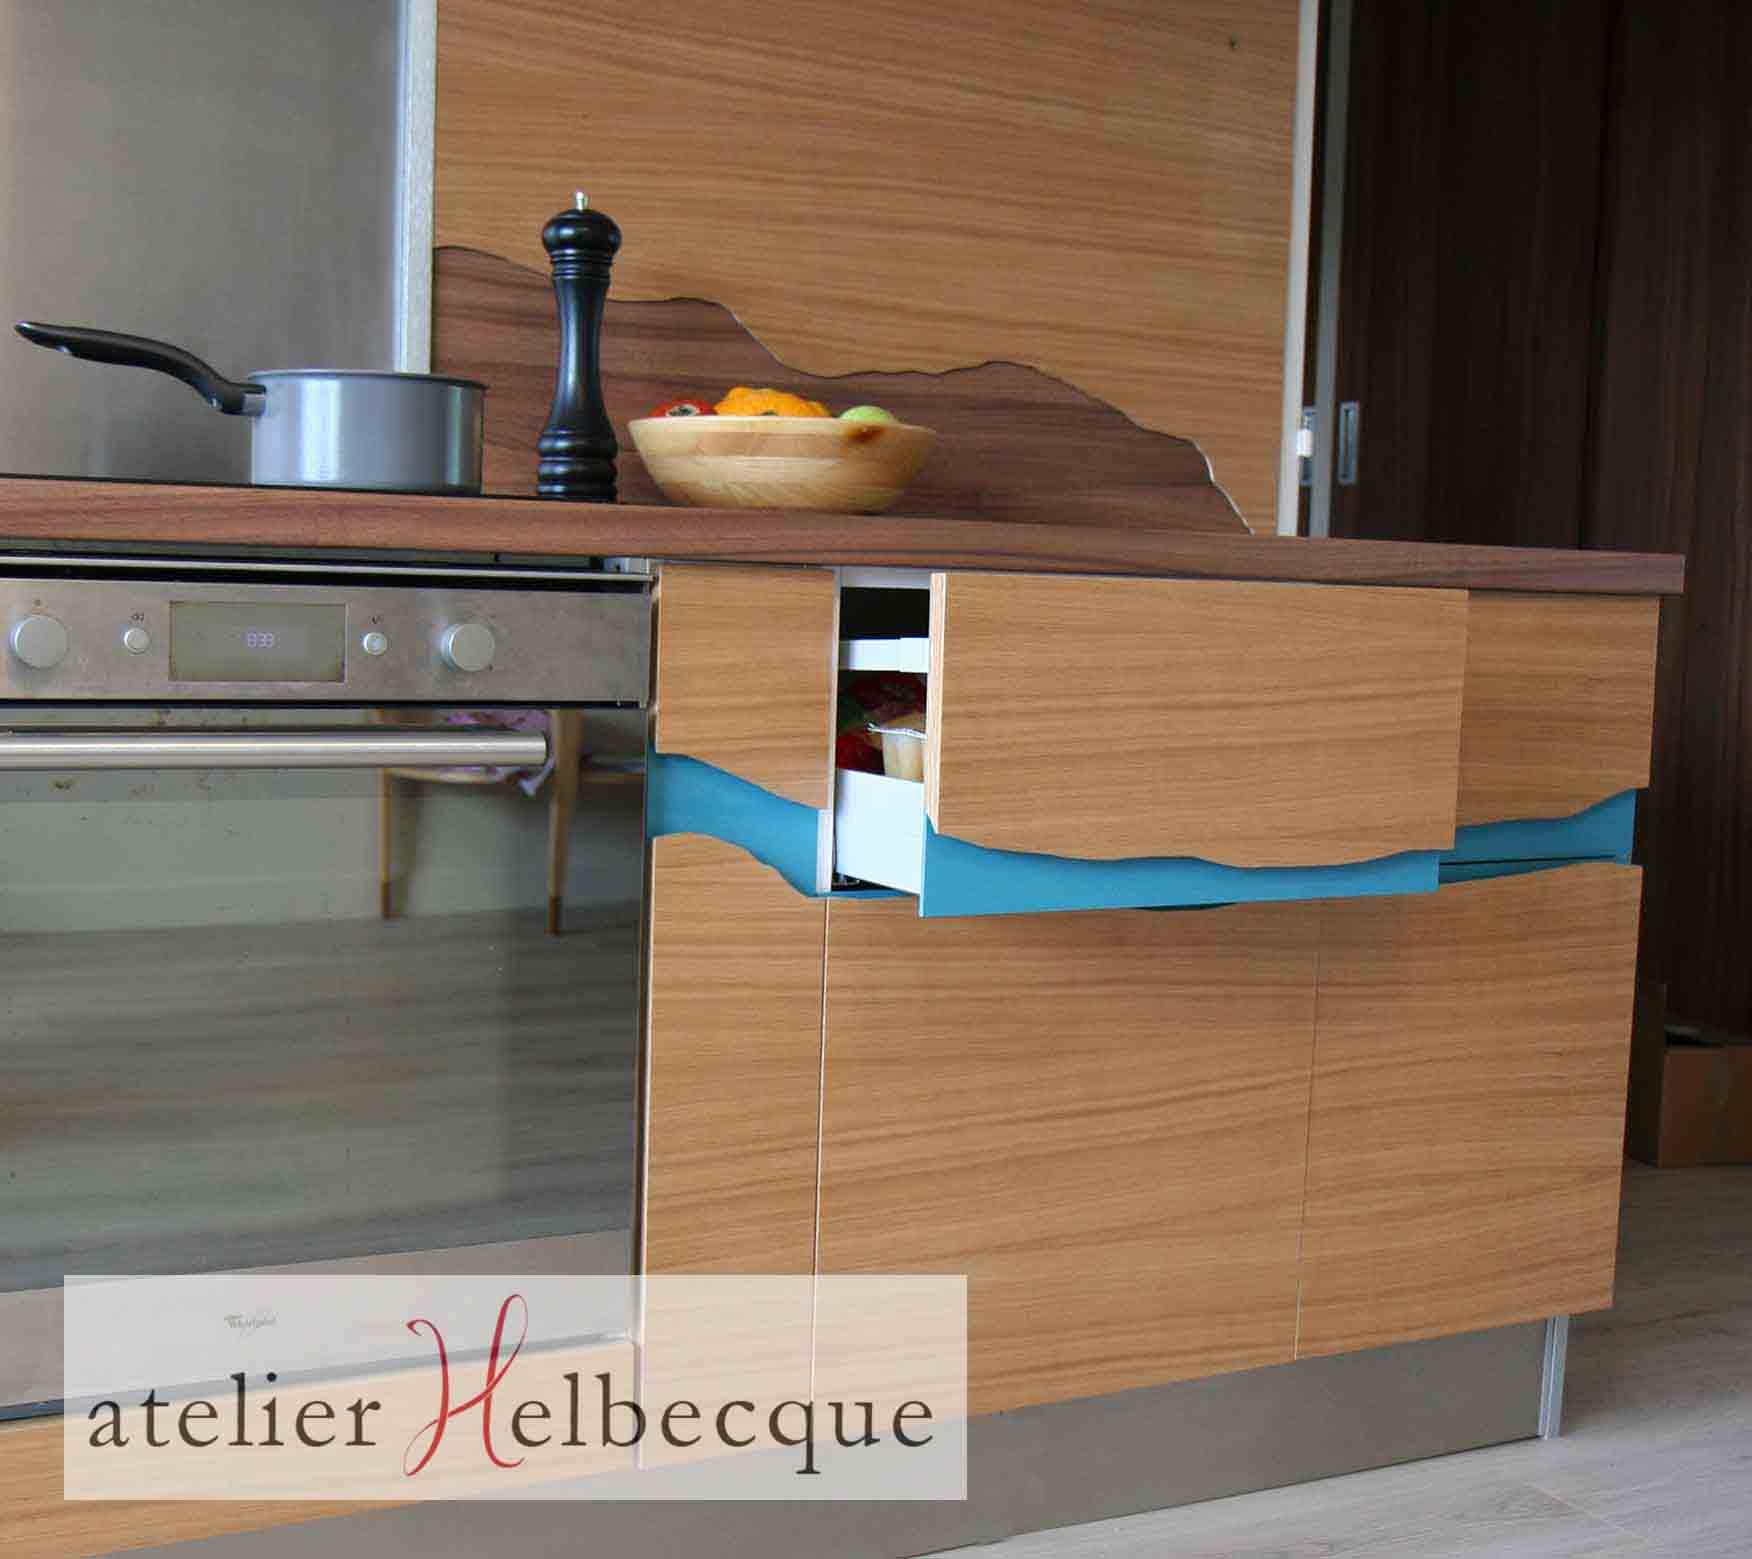 Val de marne portfolio tag atelier helbecque 94 ile - Habillage cuisine ...